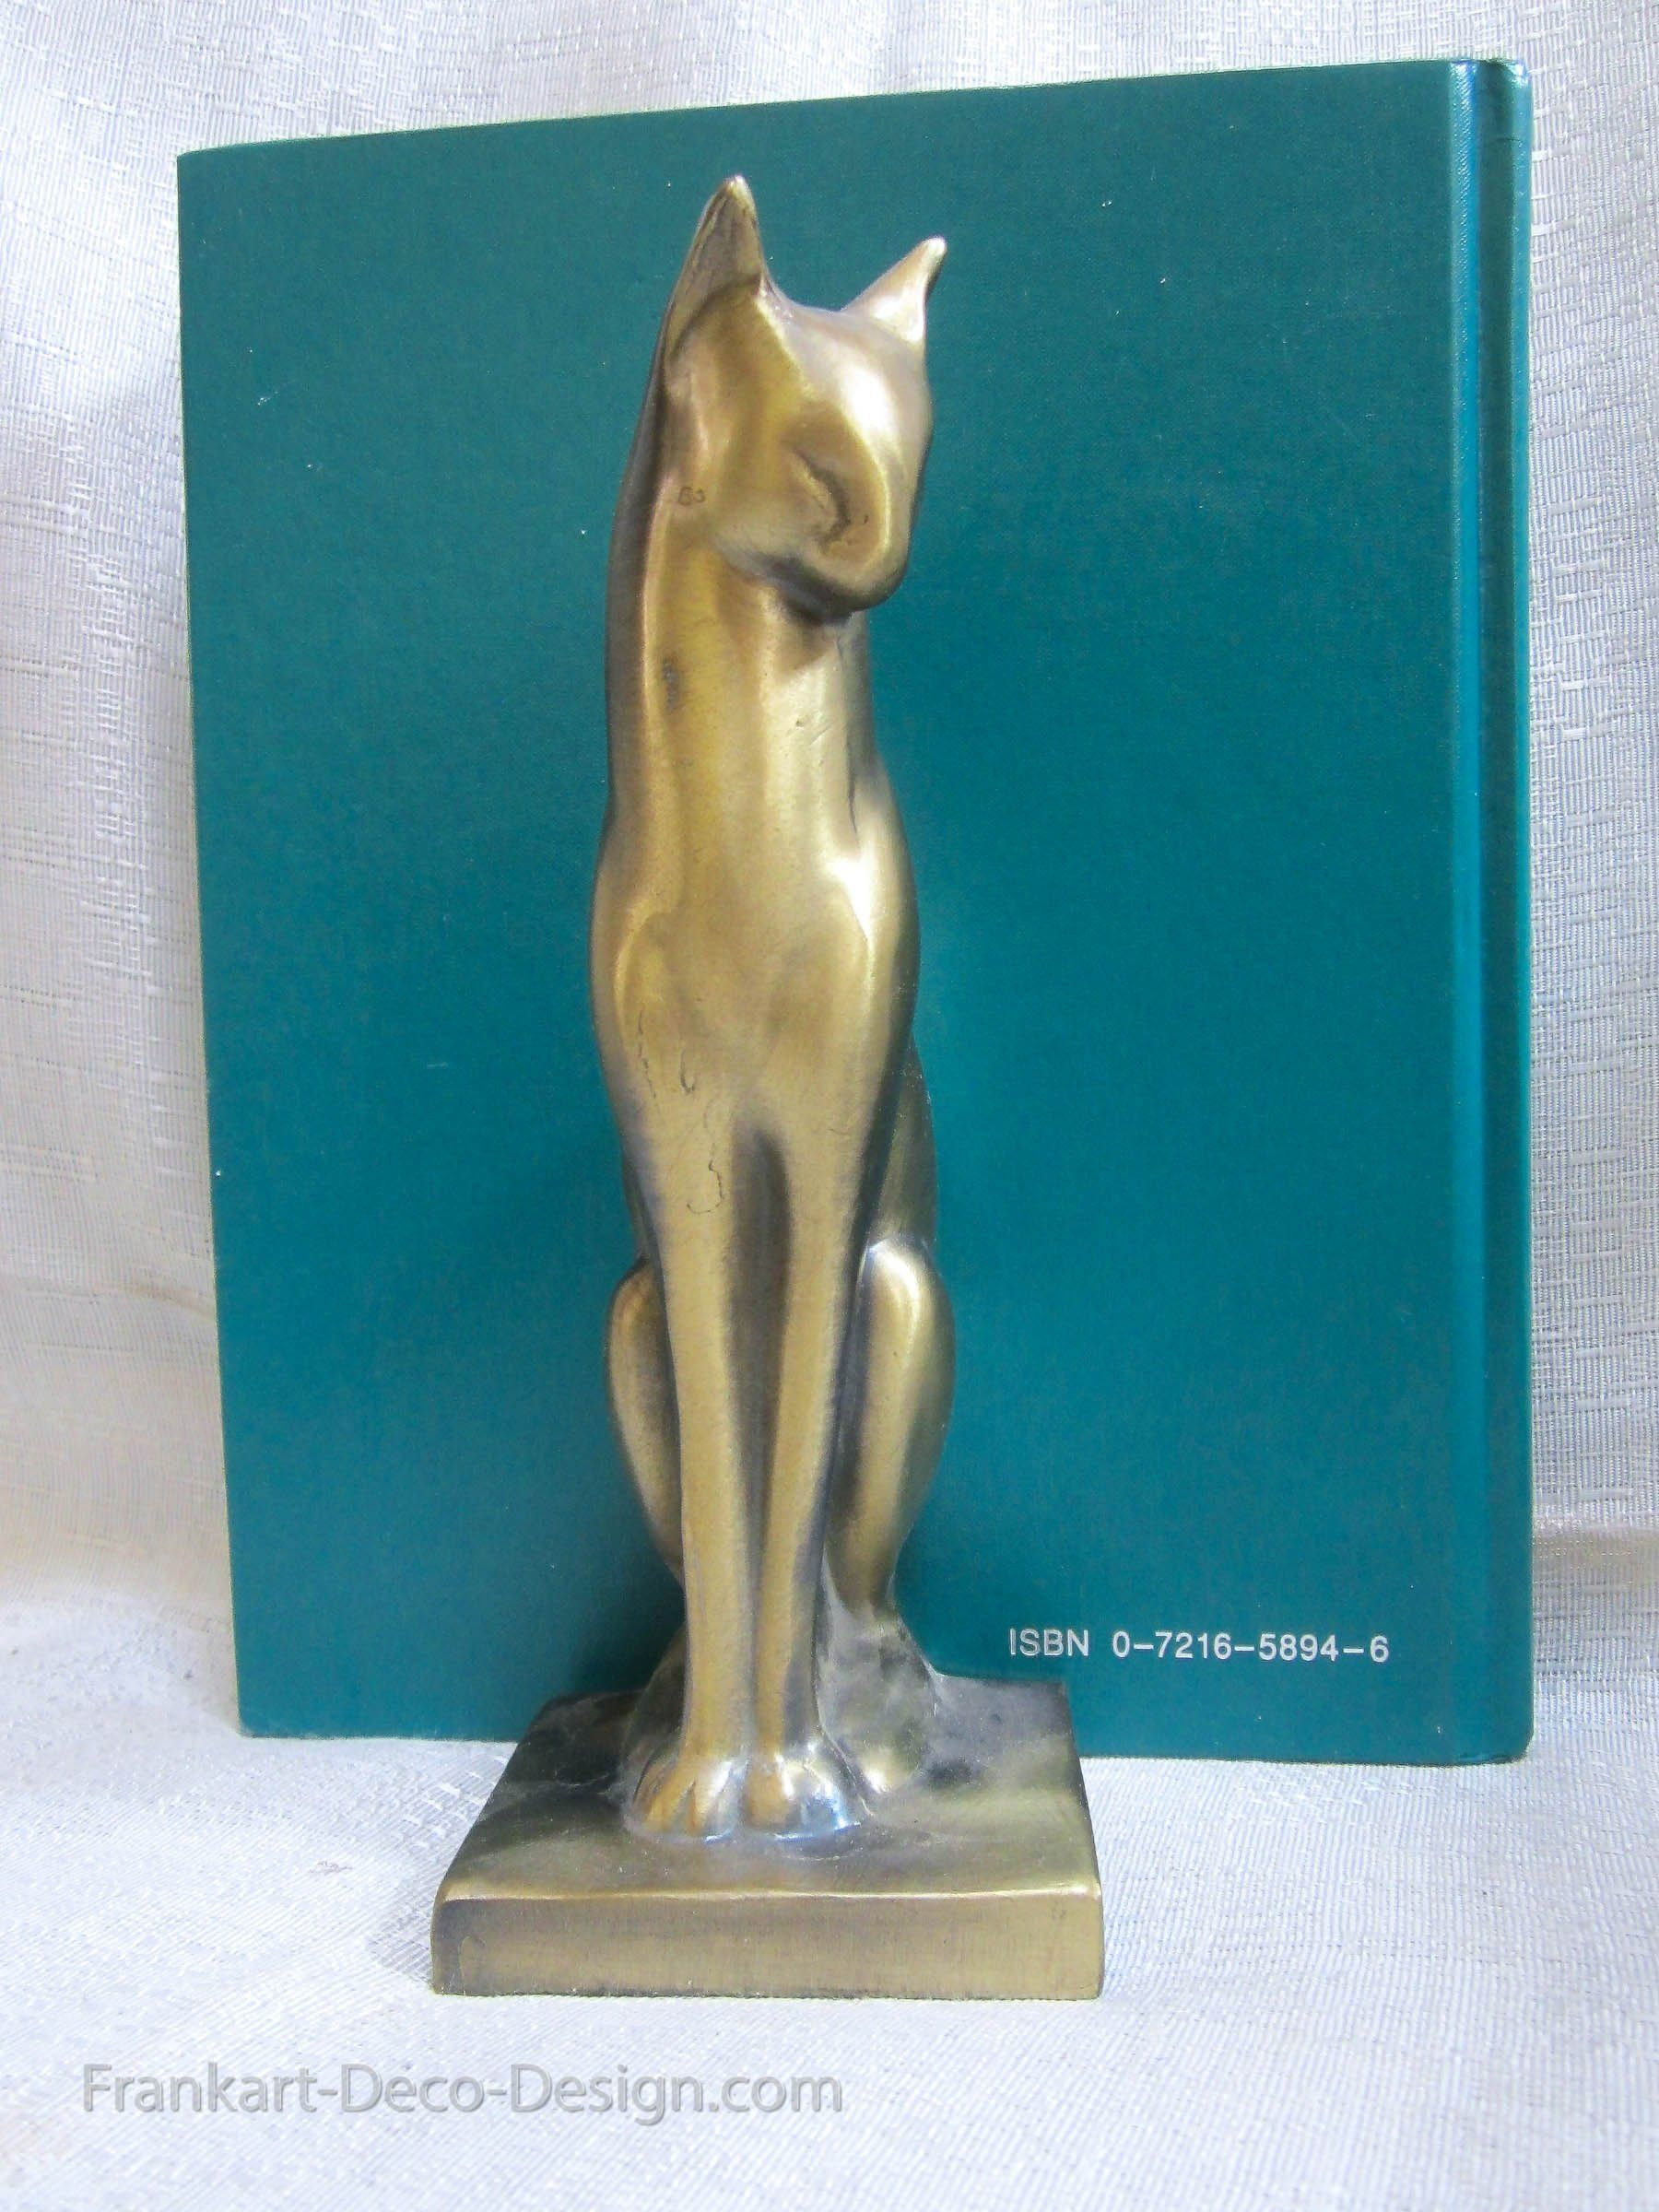 Frankart Sitting Cat brass art deco moderne bookends, 2 singles ...